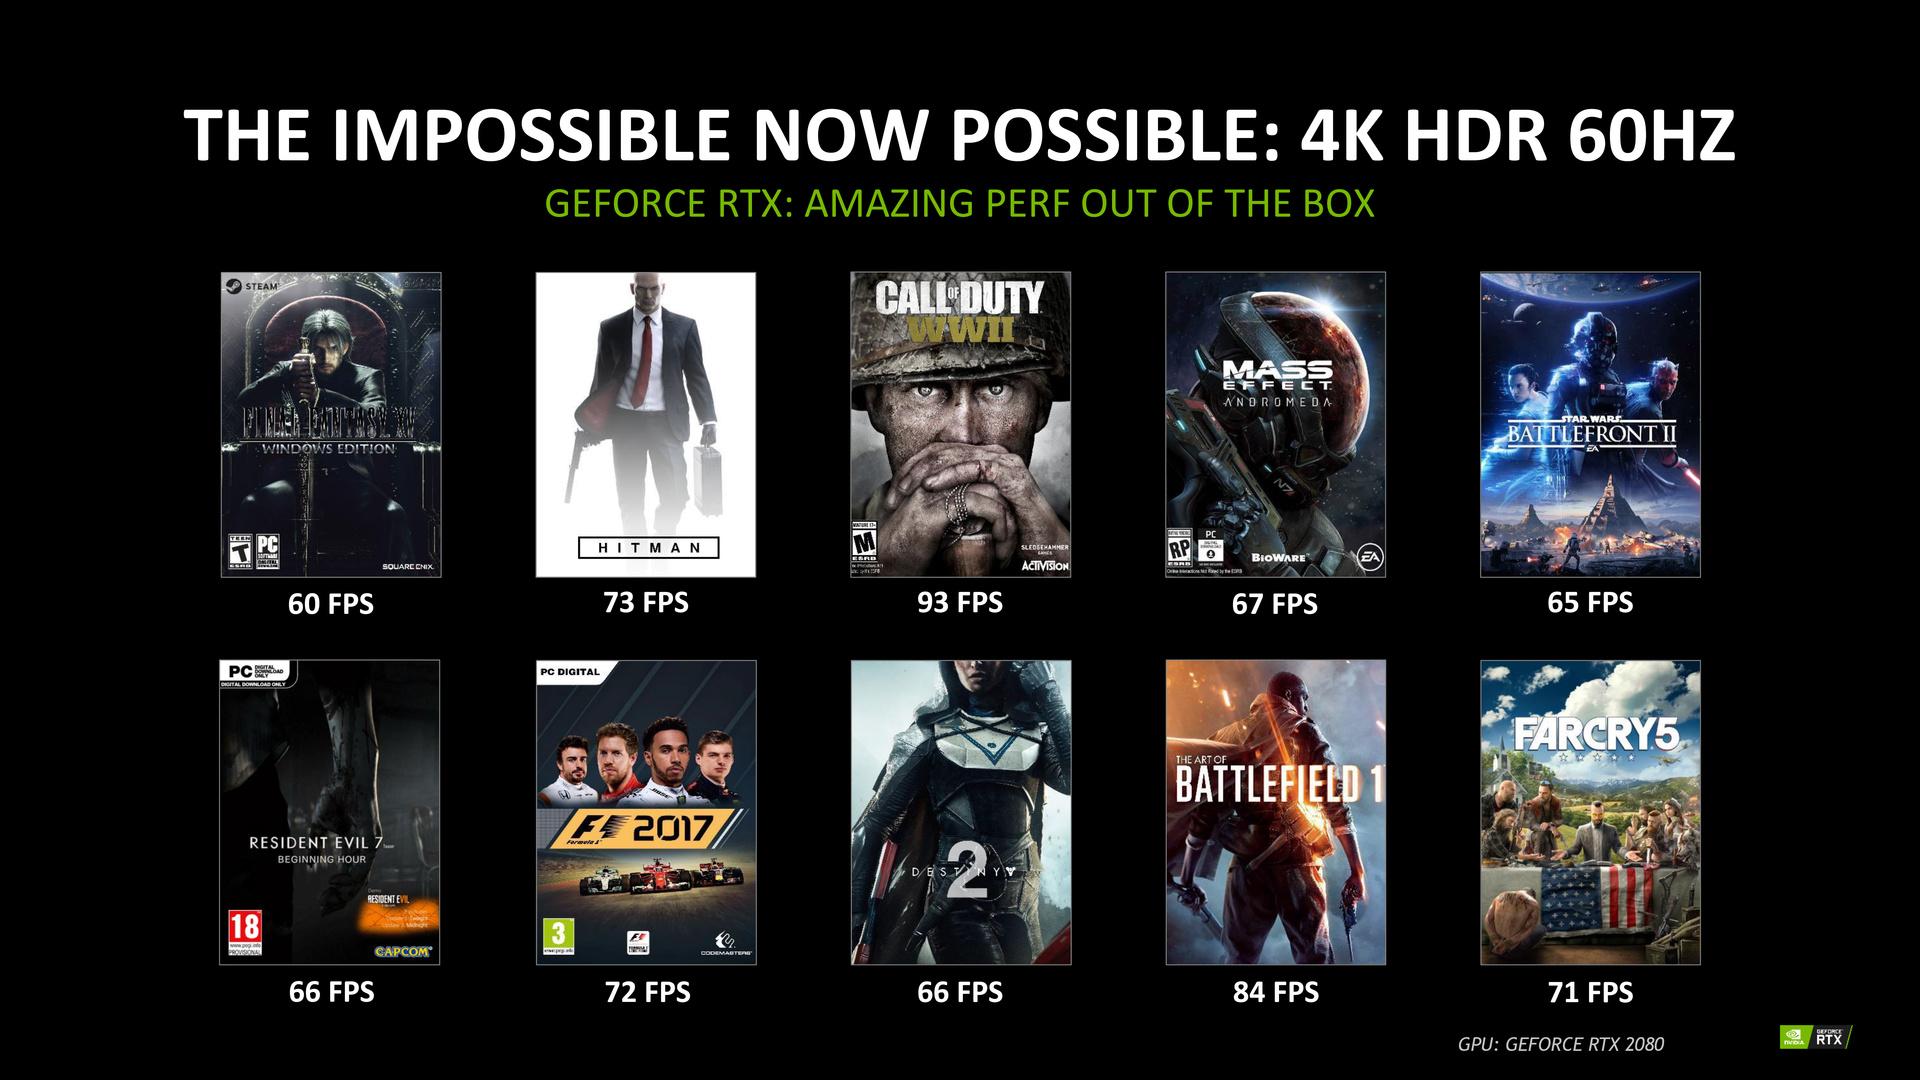 GeForce RTX 2080 – Performance laut Nvidia